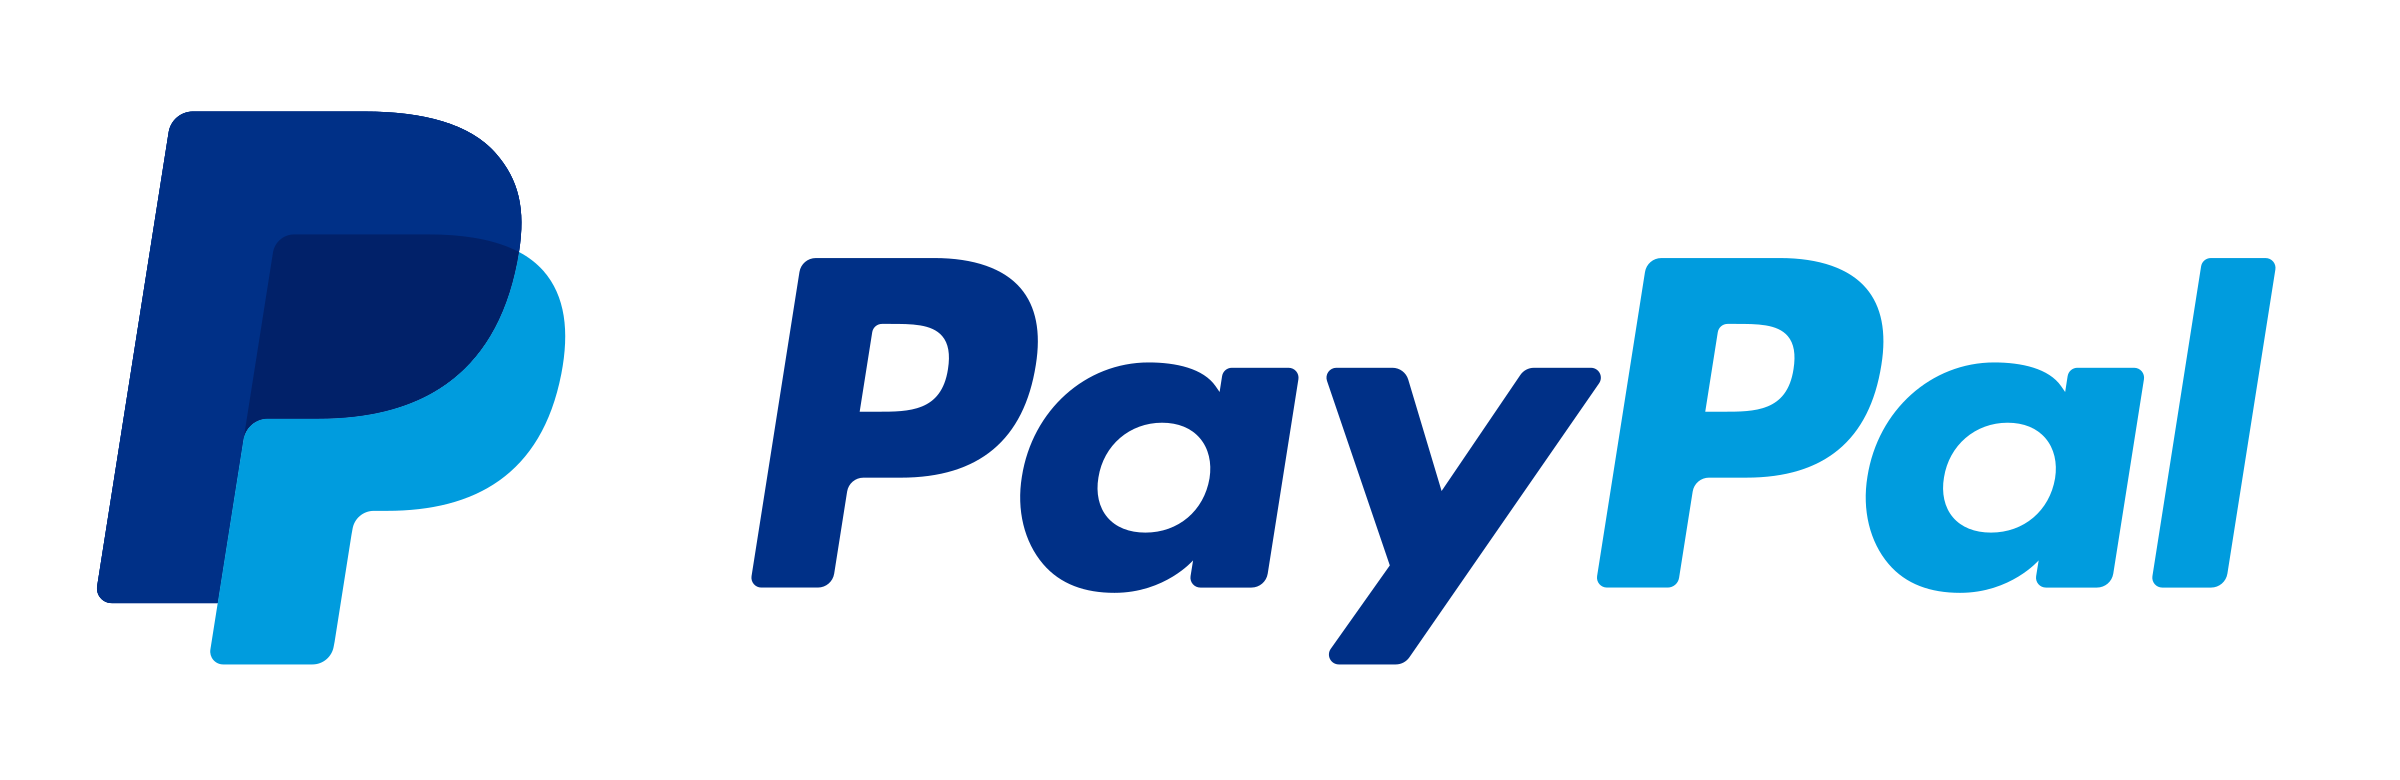 paypal-logo-png-transparent